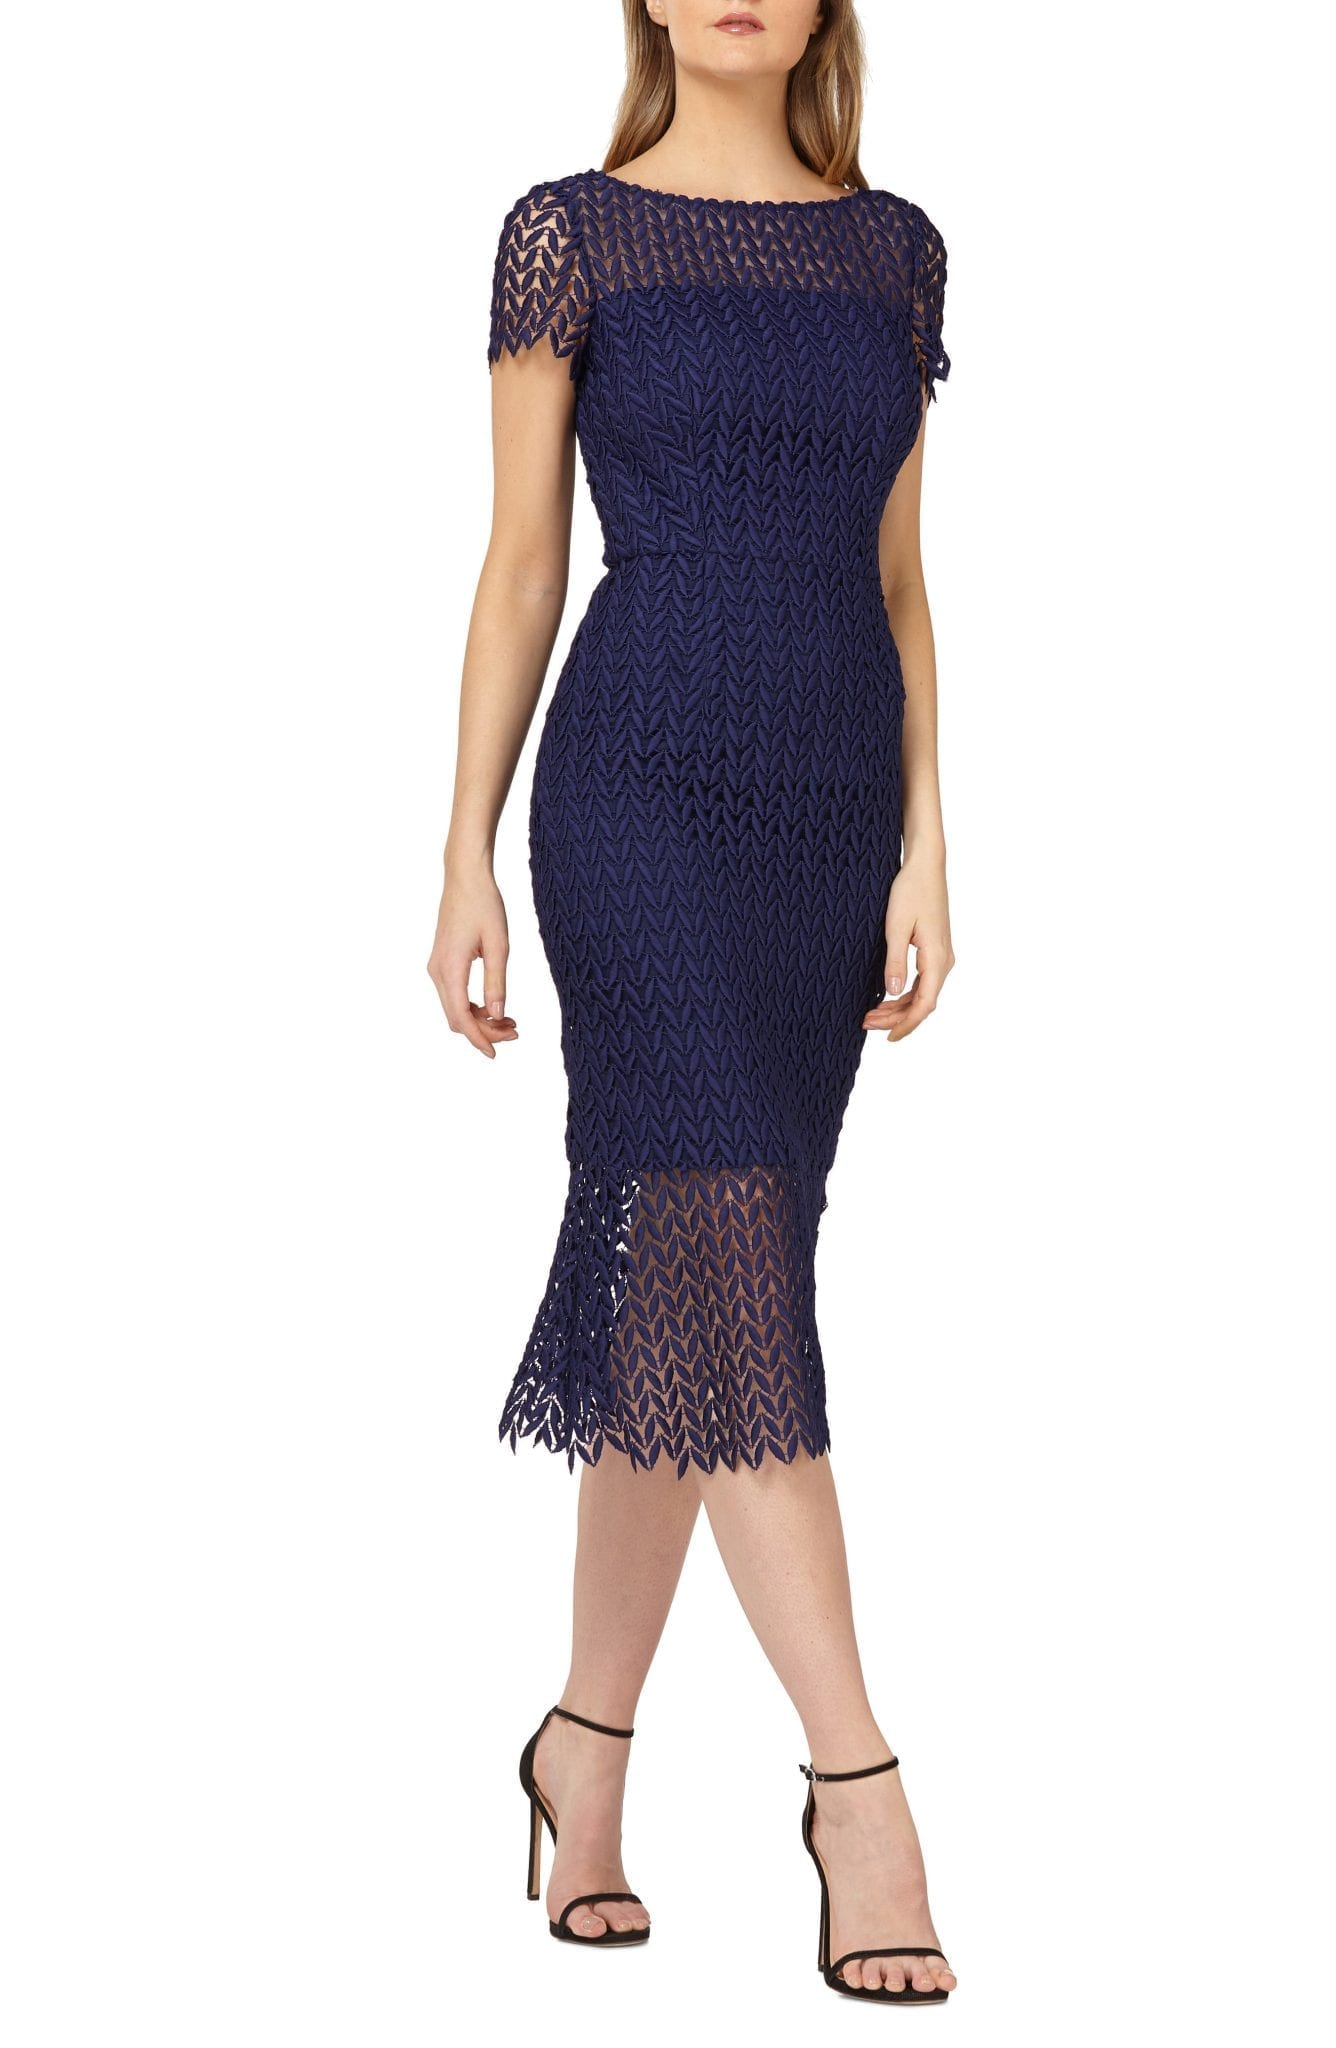 KAY UNGER Floral Lace Midi Dress